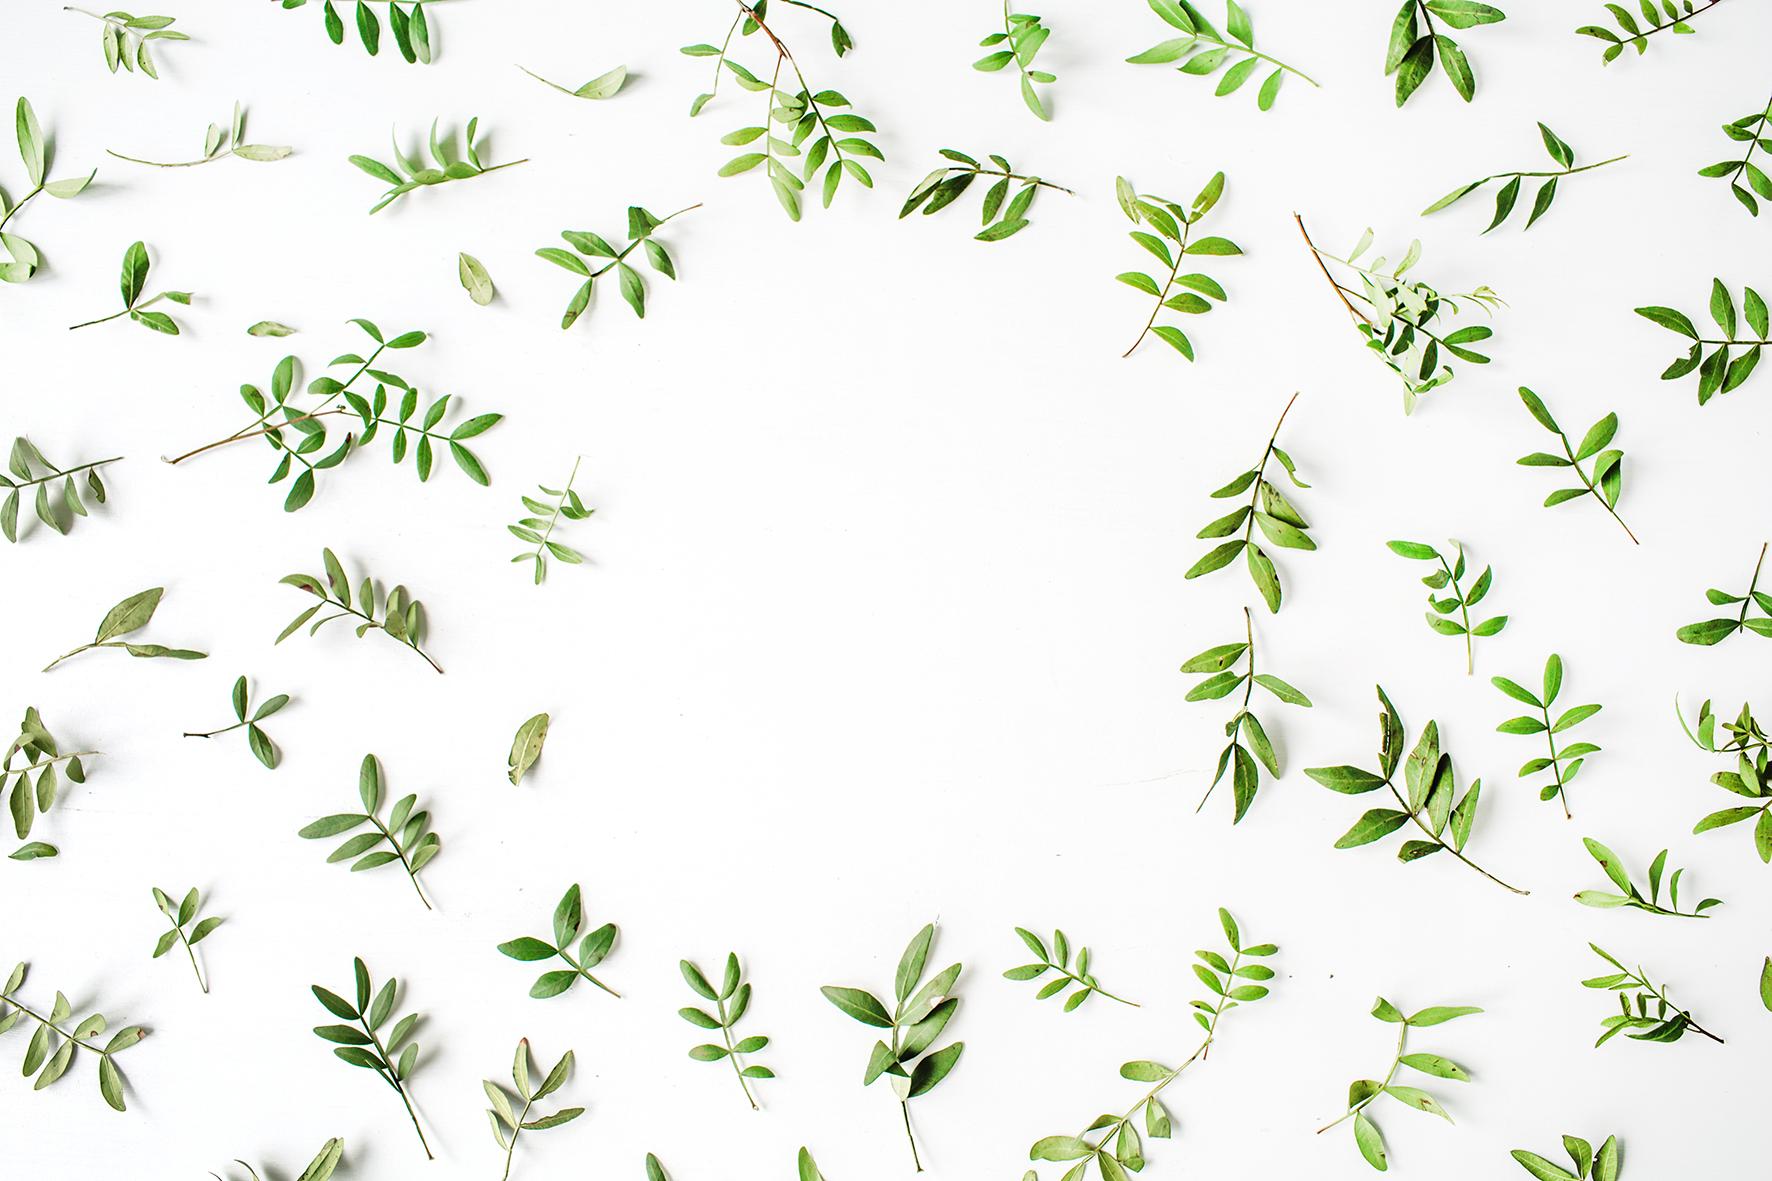 Végétal pontarlier malbuisson